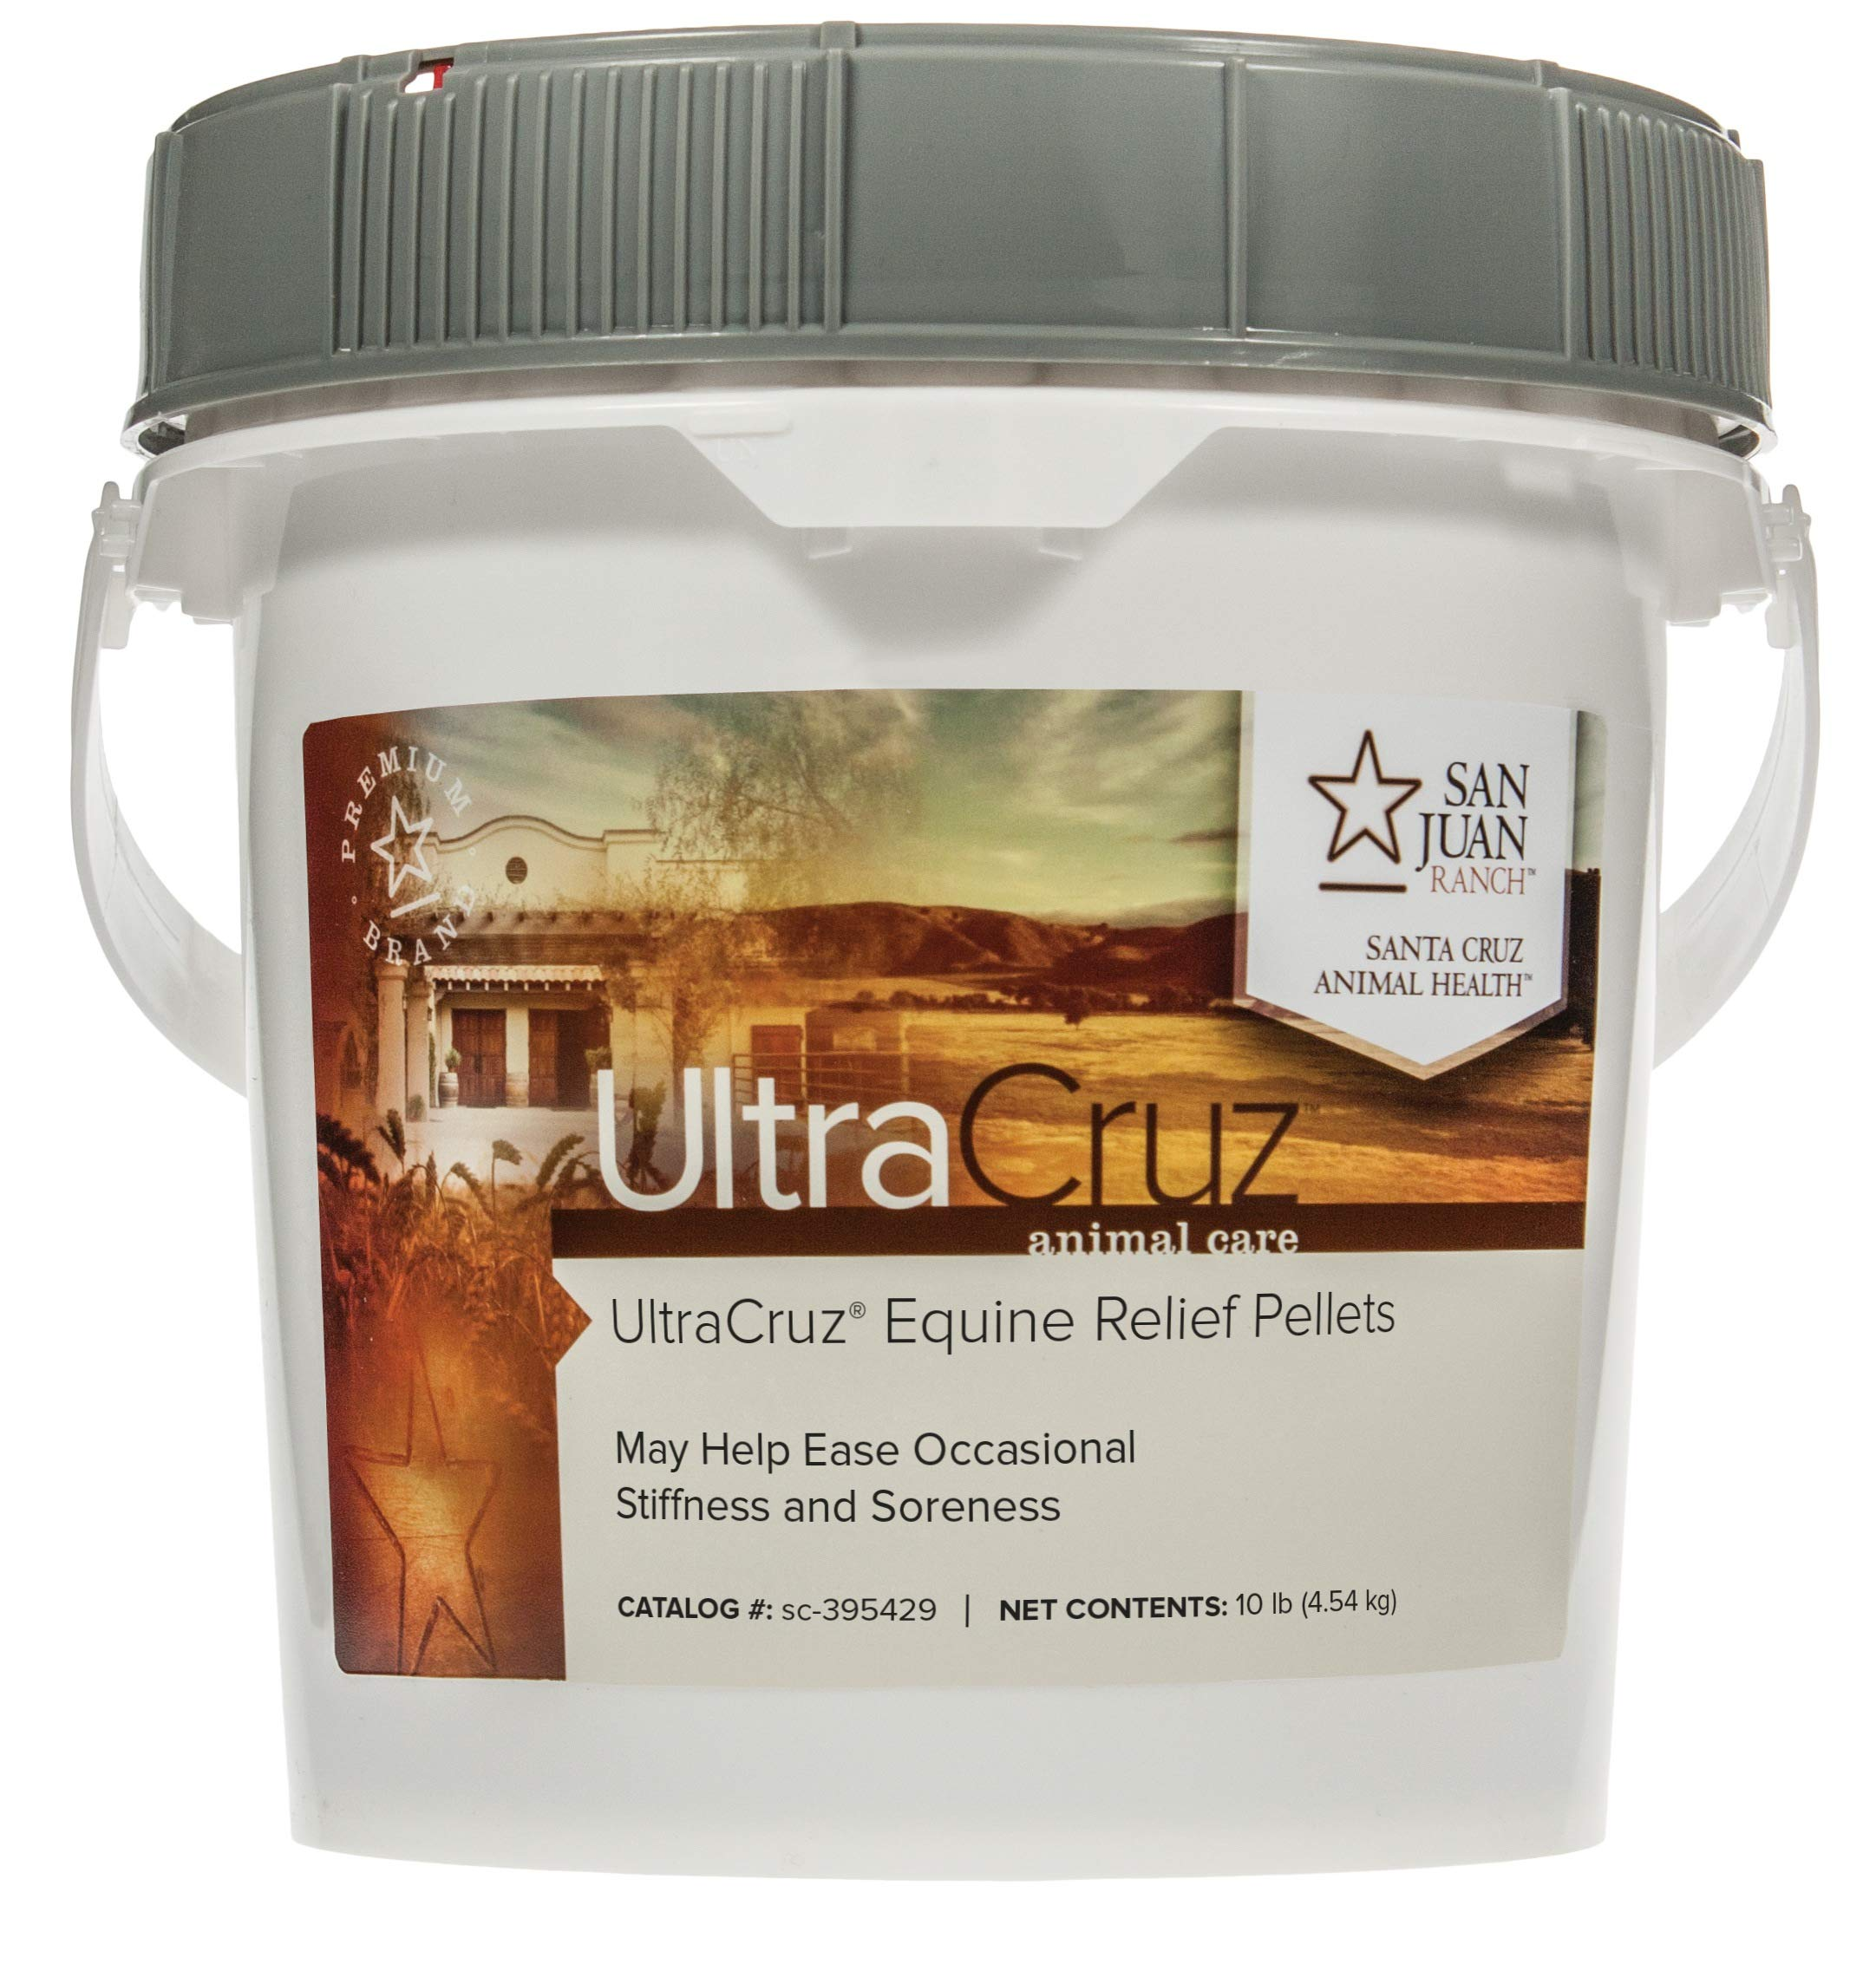 UltraCruz Equine Relief Supplement for Horses, 10 lb, Pellet (160 Day Supply) by UltraCruz